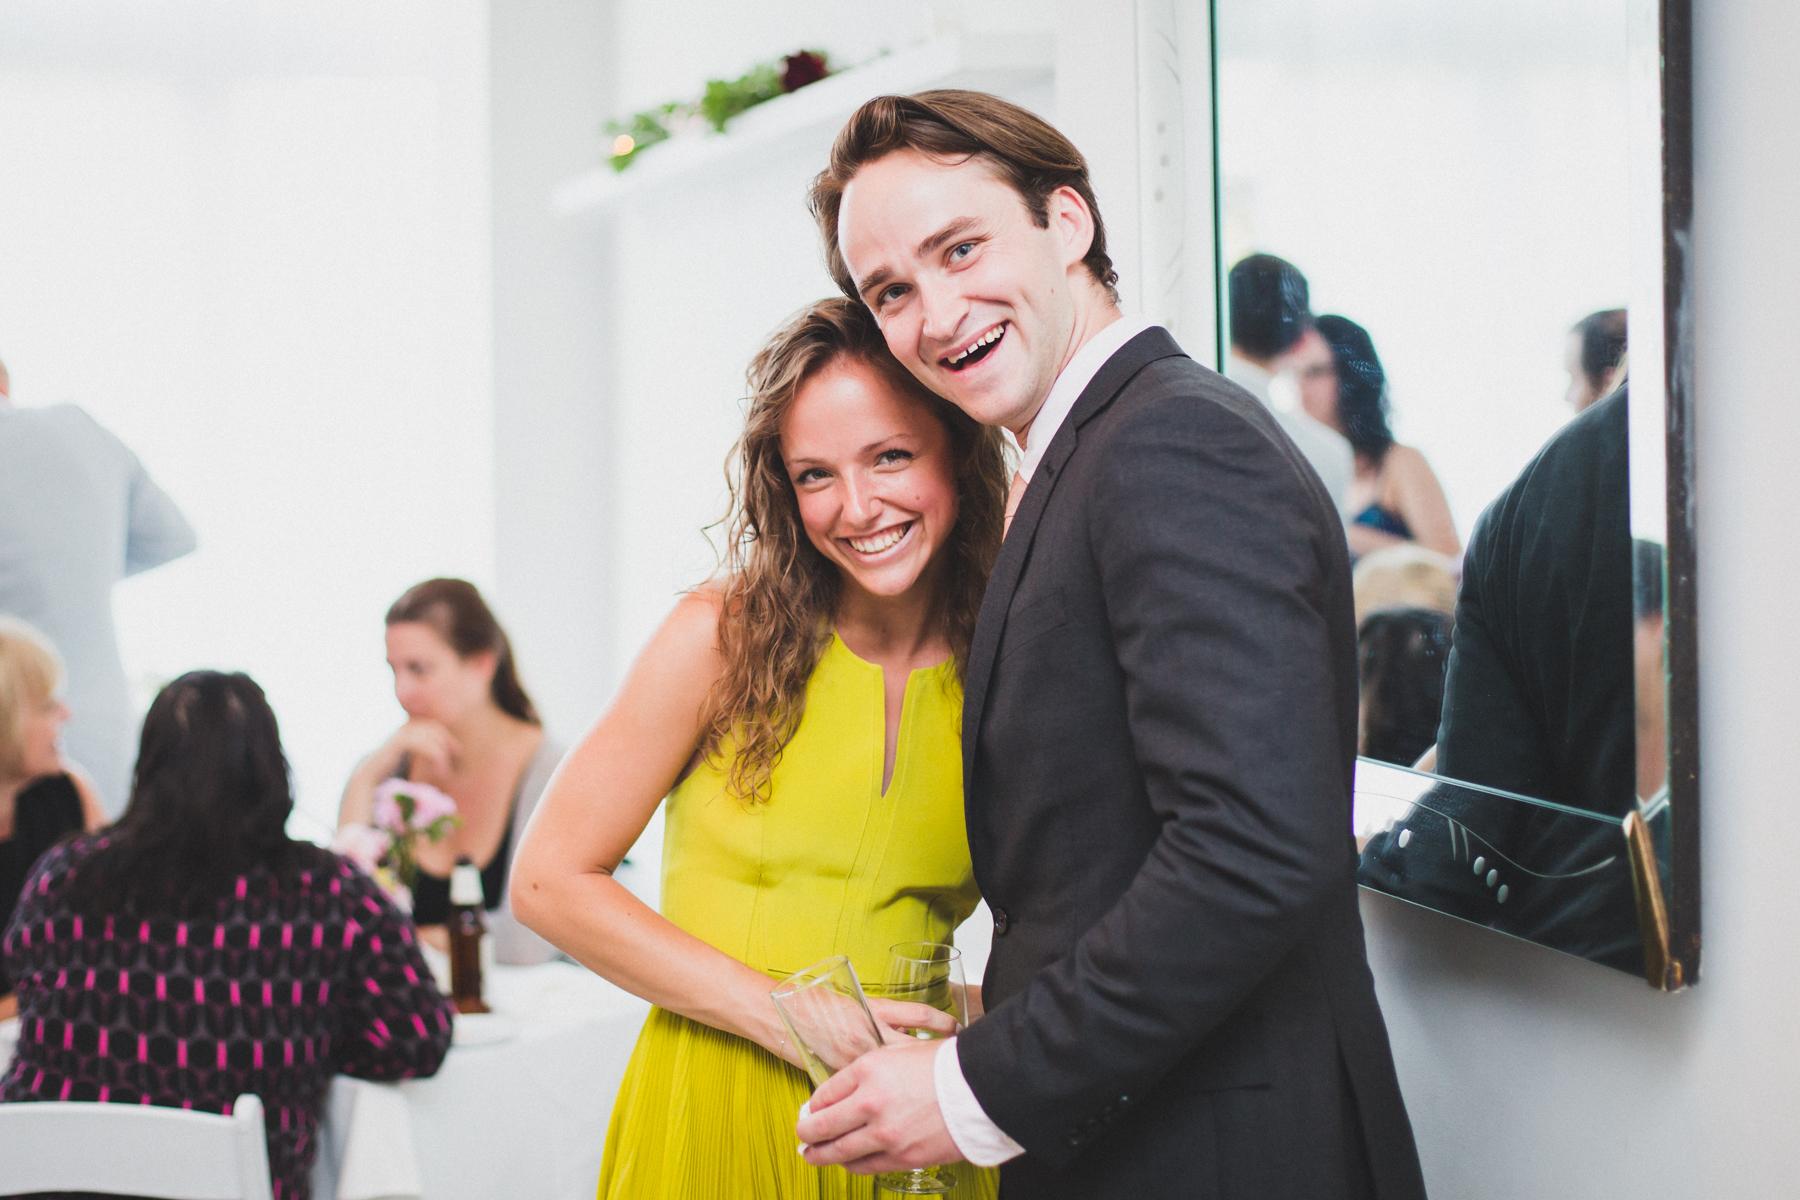 ICI-Restaurant-Fort-Greene-Brooklyn-Intimate-Documentary-Wedding-Photography-Elvira-Kalviste-66.jpg